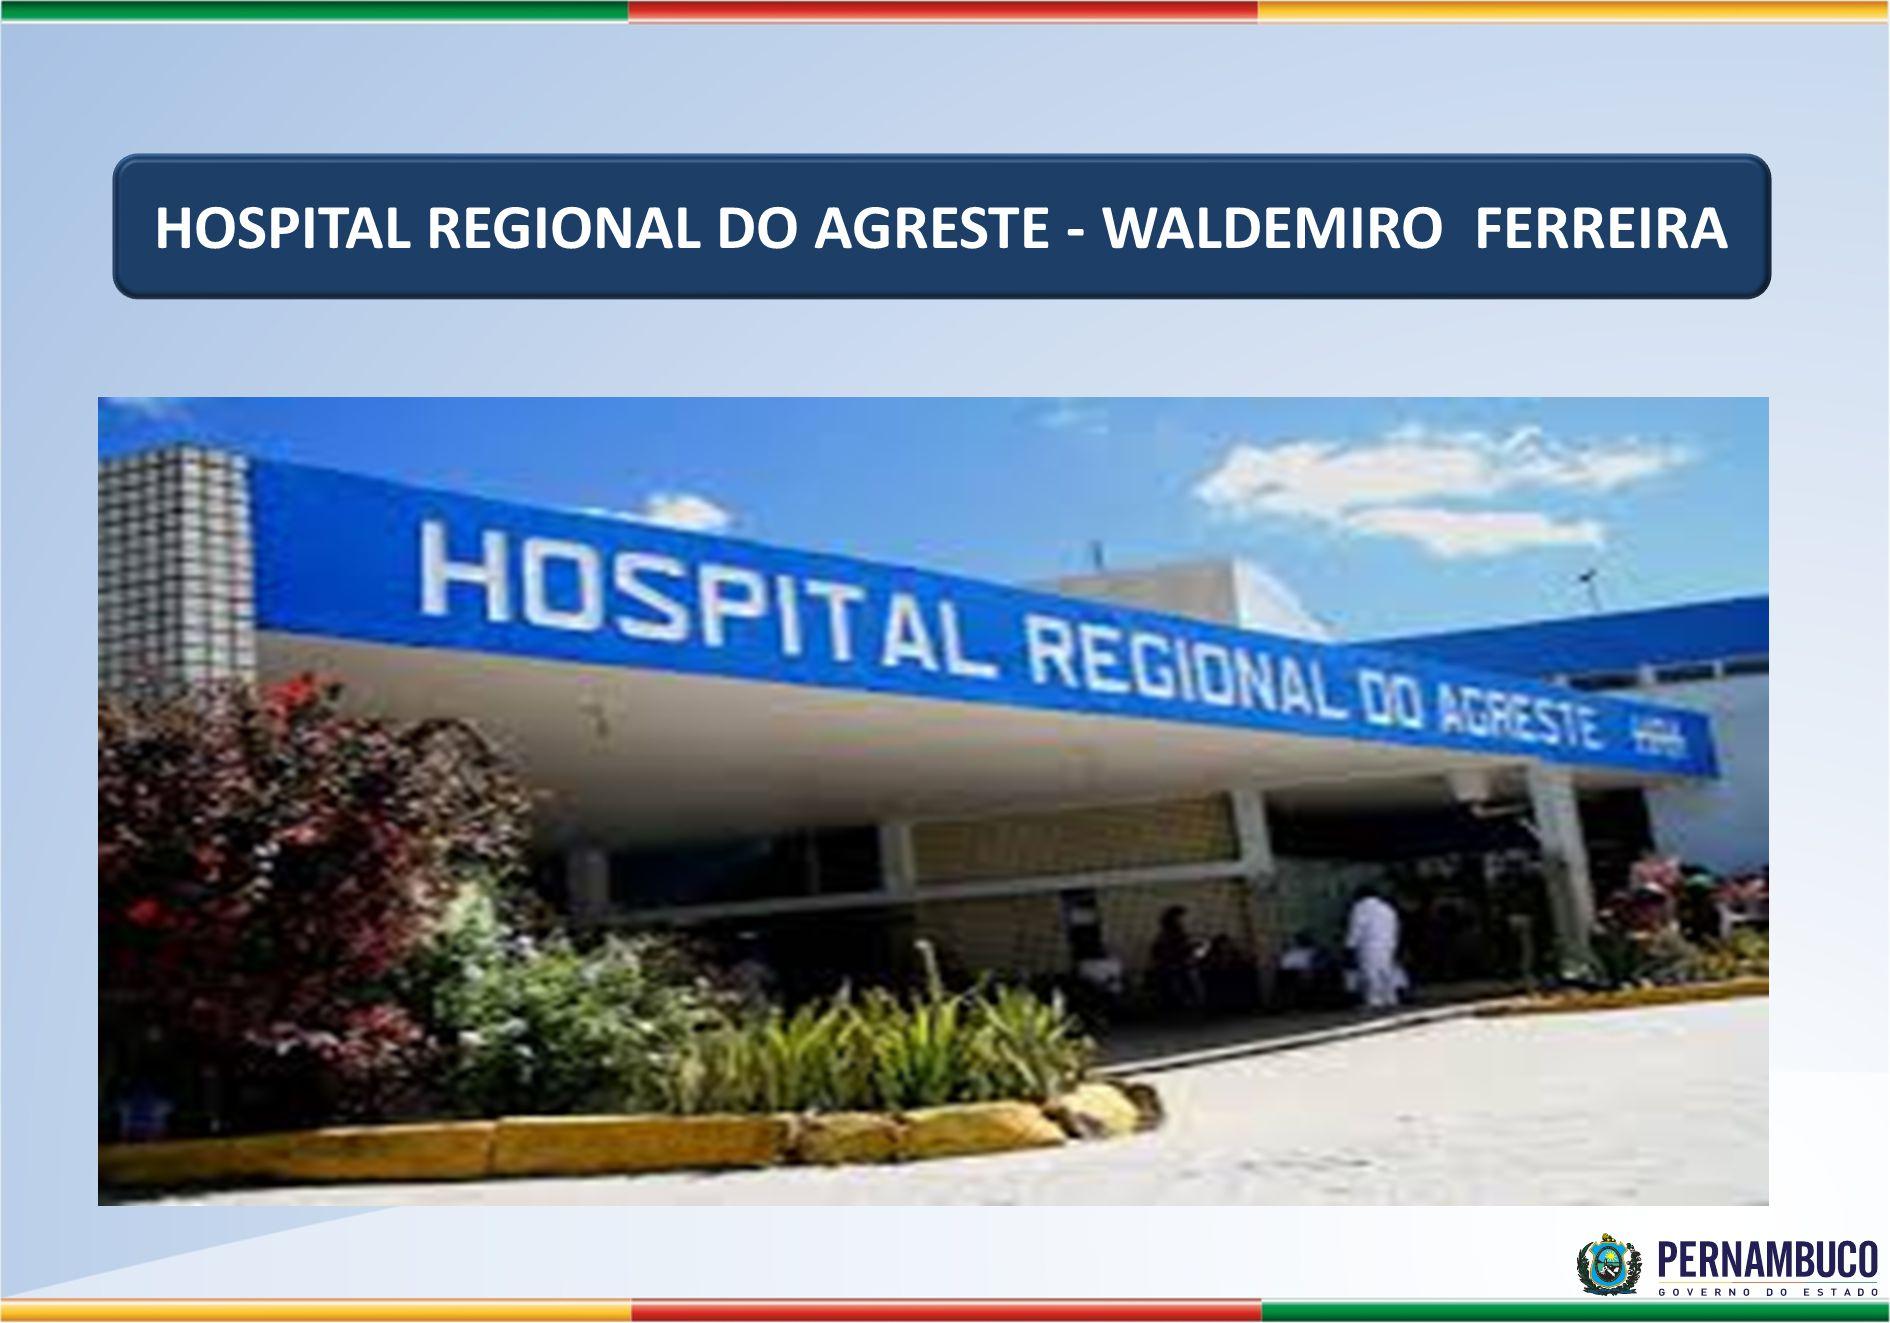 HOSPITAL REGIONAL DO AGRESTE - WALDEMIRO FERREIRA